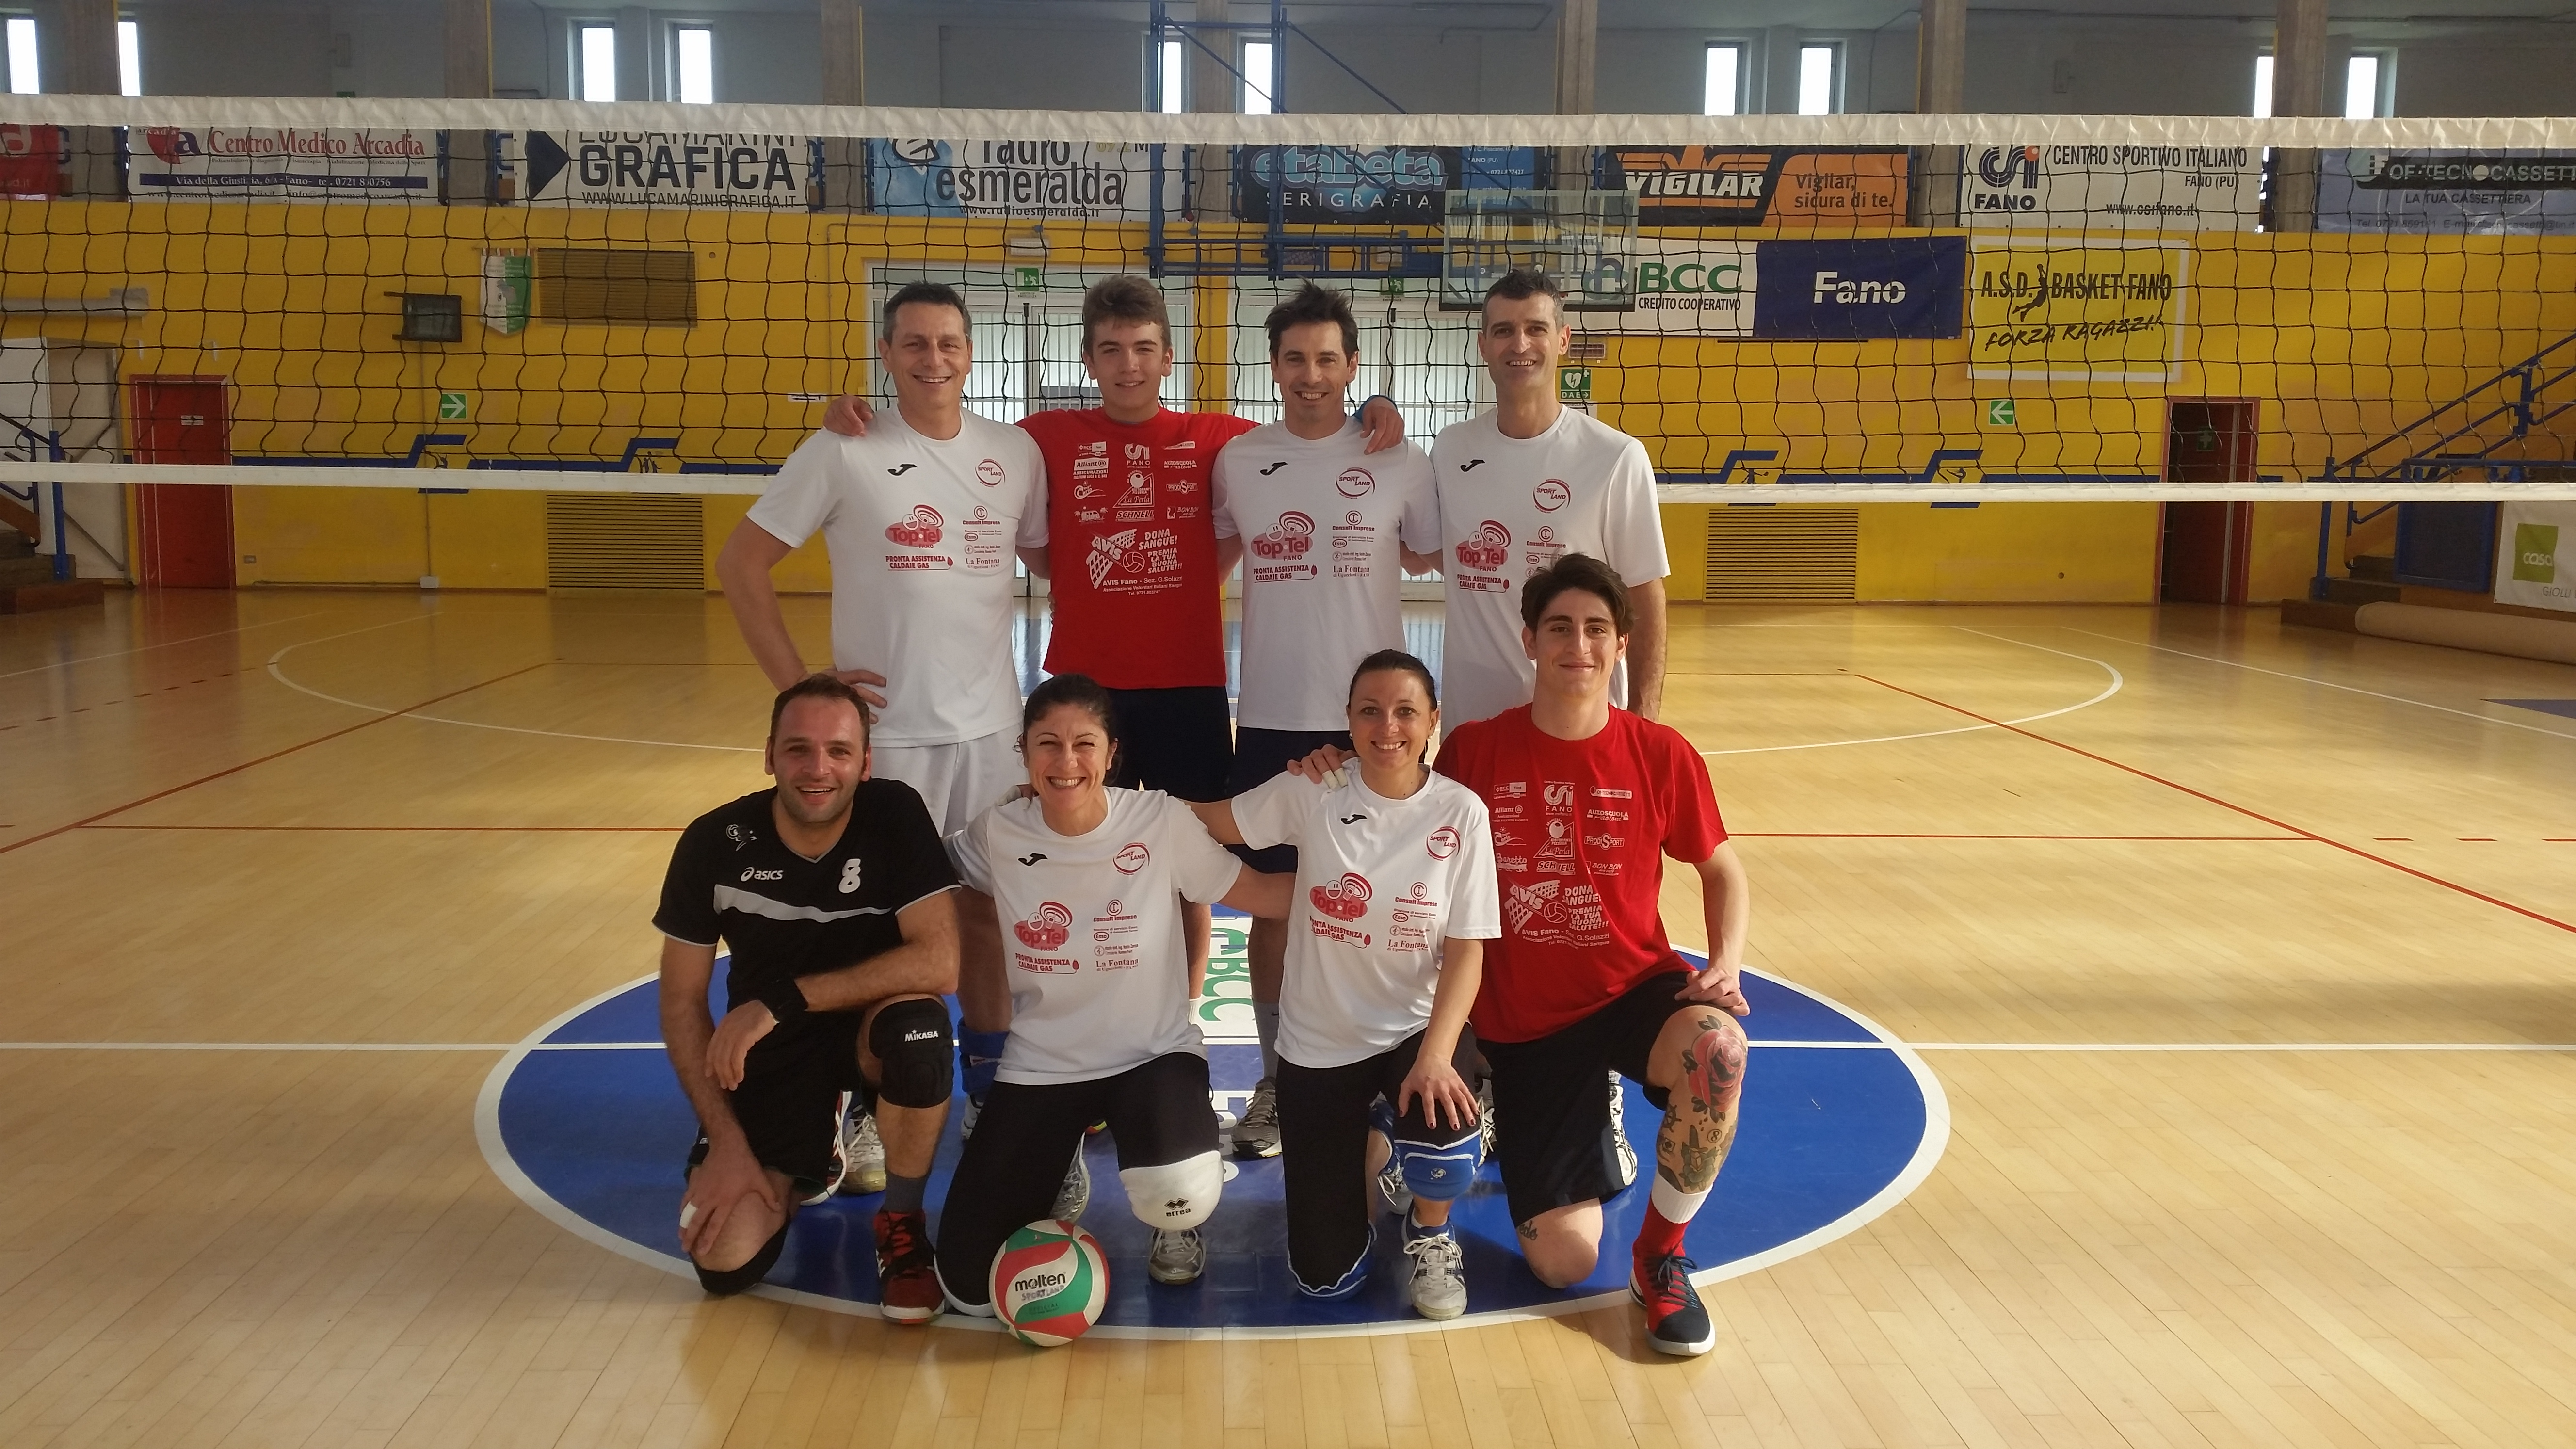 Asd Sportland 2class Amatori csi